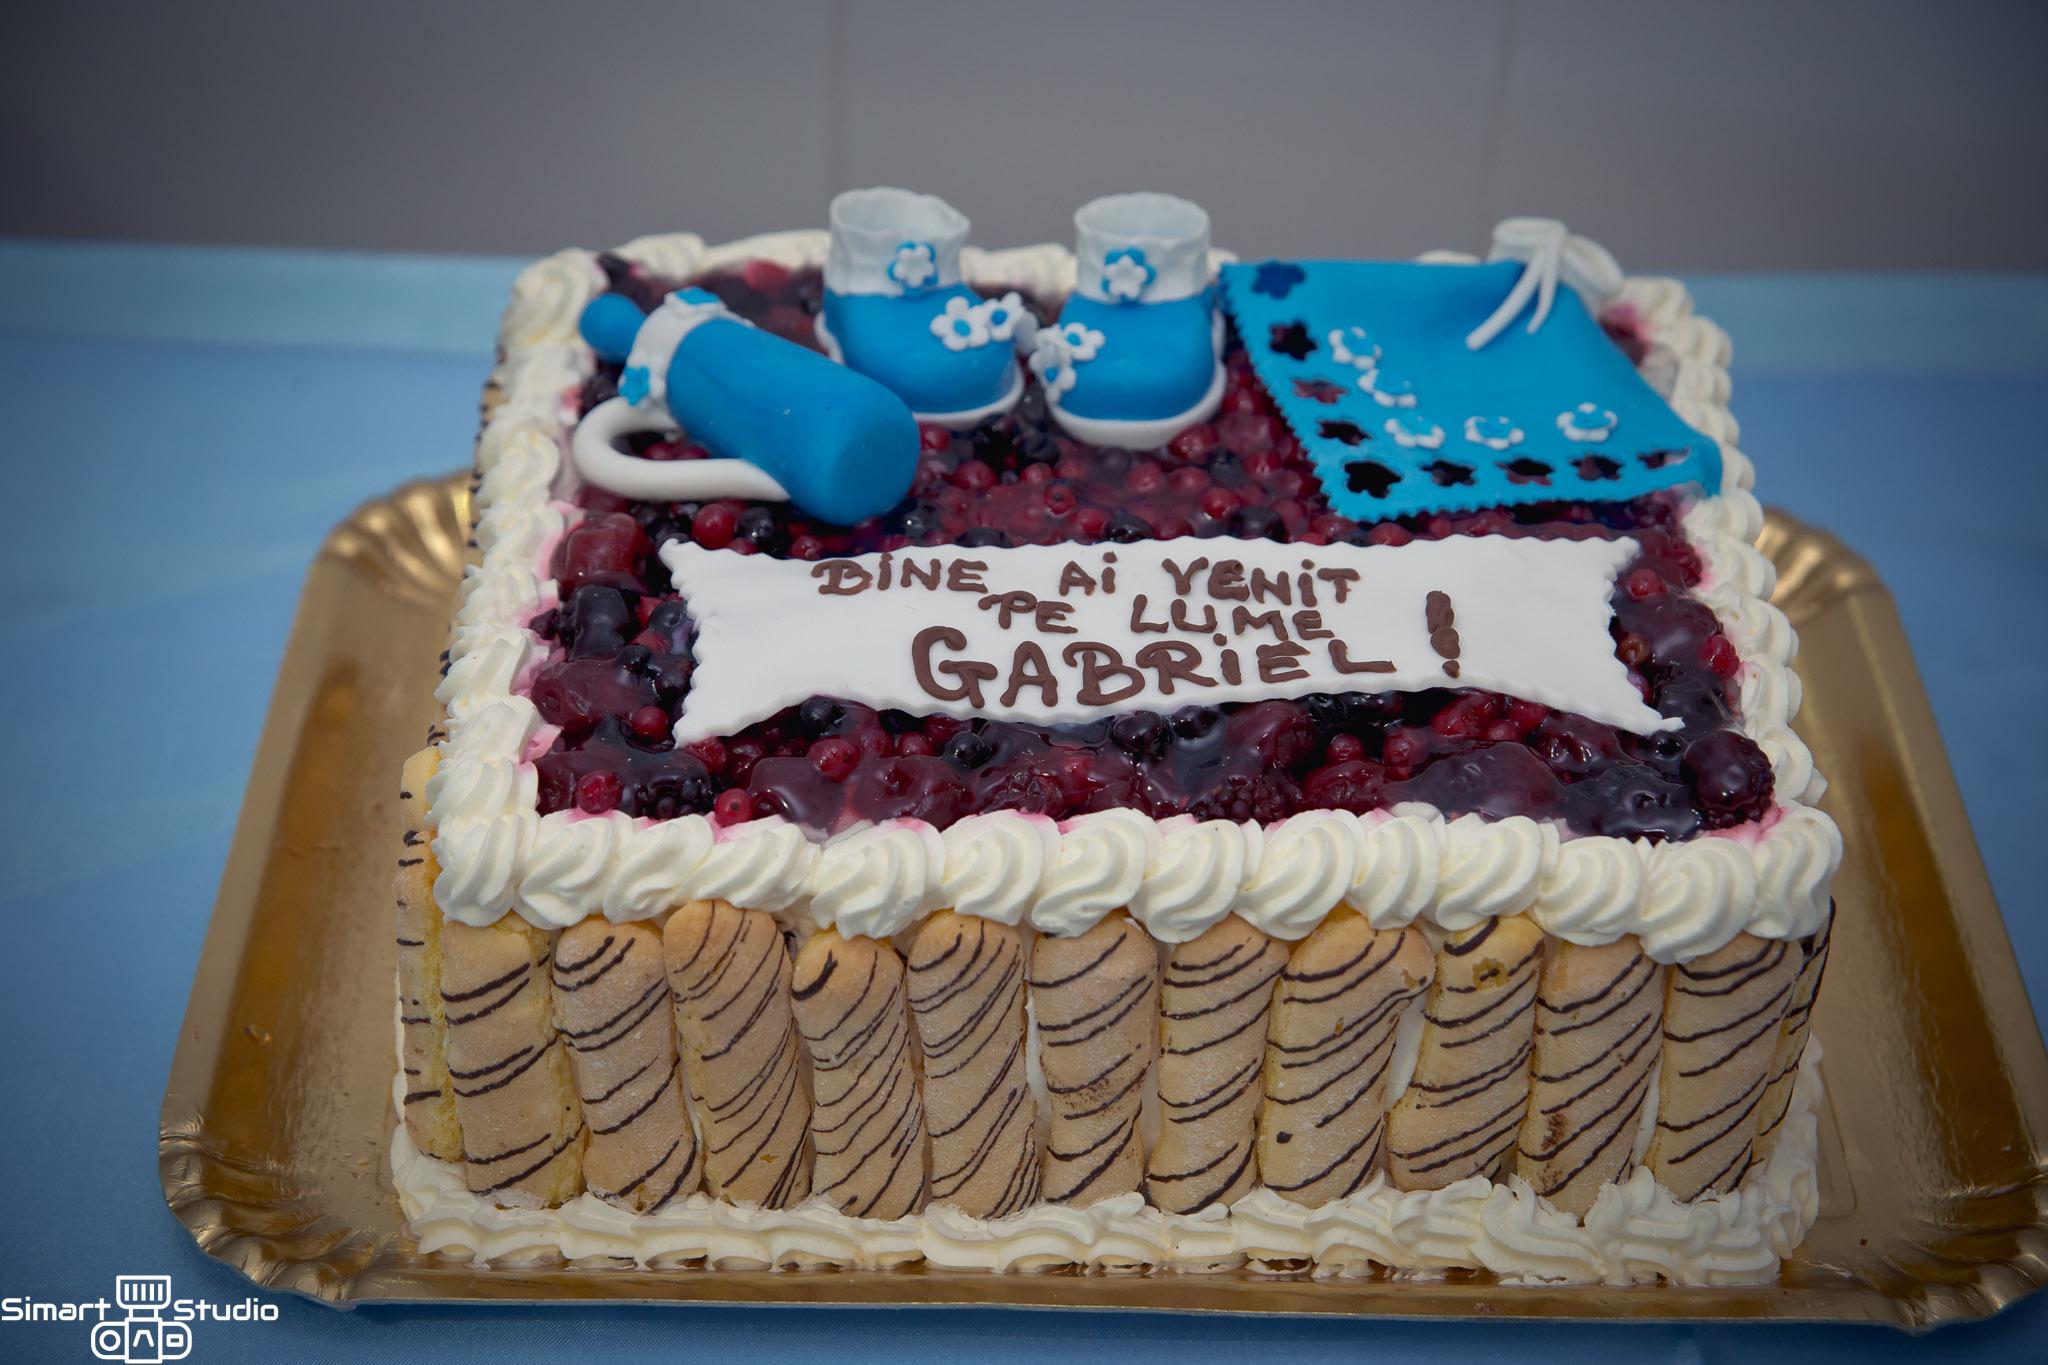 Botez Gabriel-simartstudio 0638